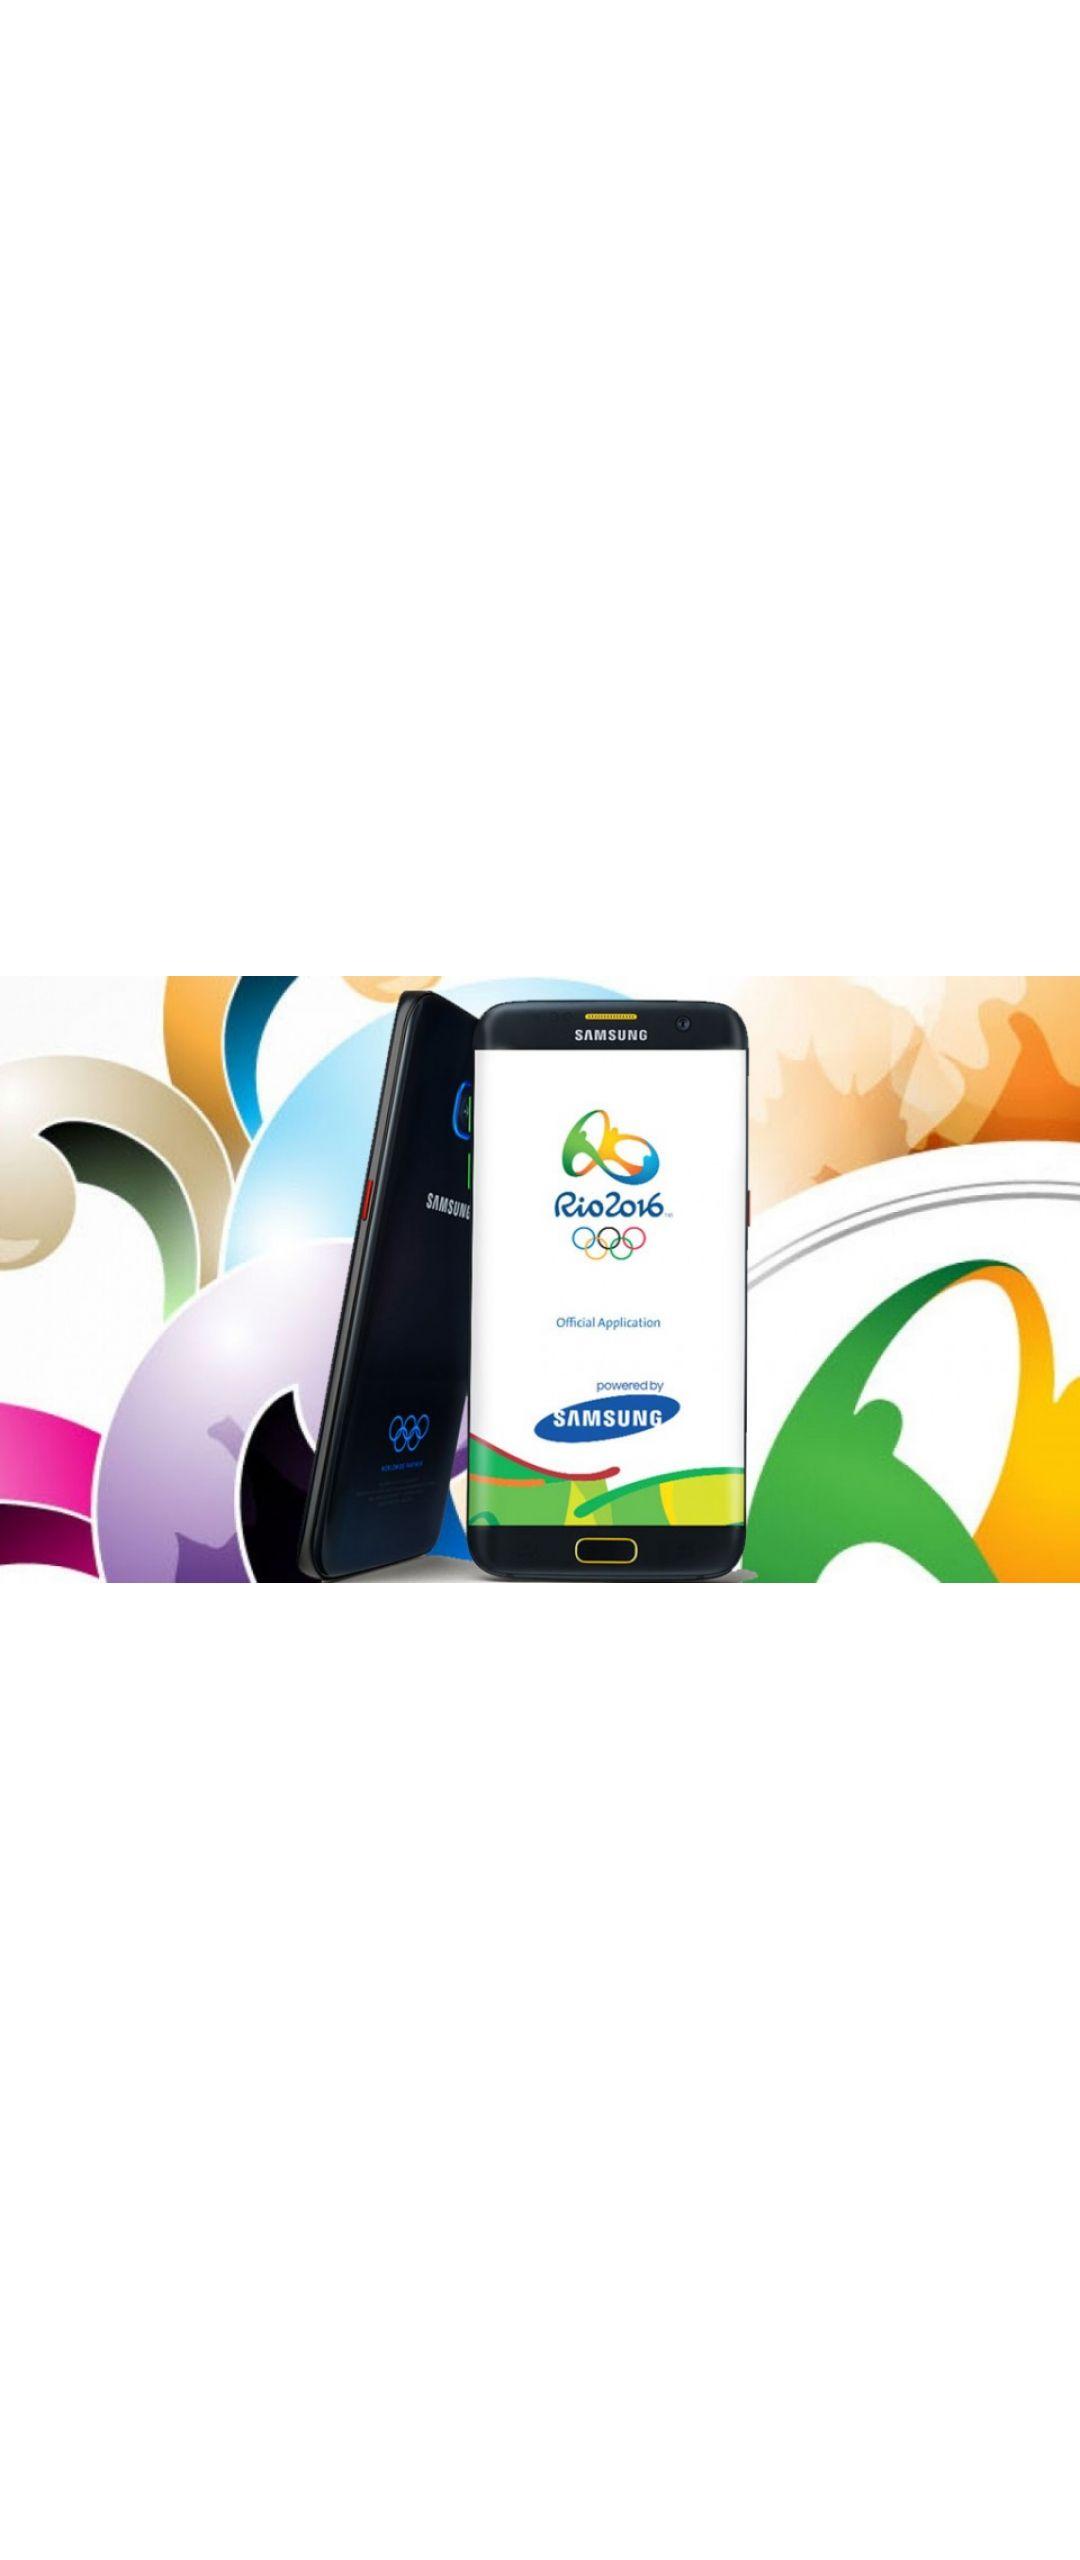 Samsung muestra a detalle su Galaxy S7 Edge Olympic Games Edition